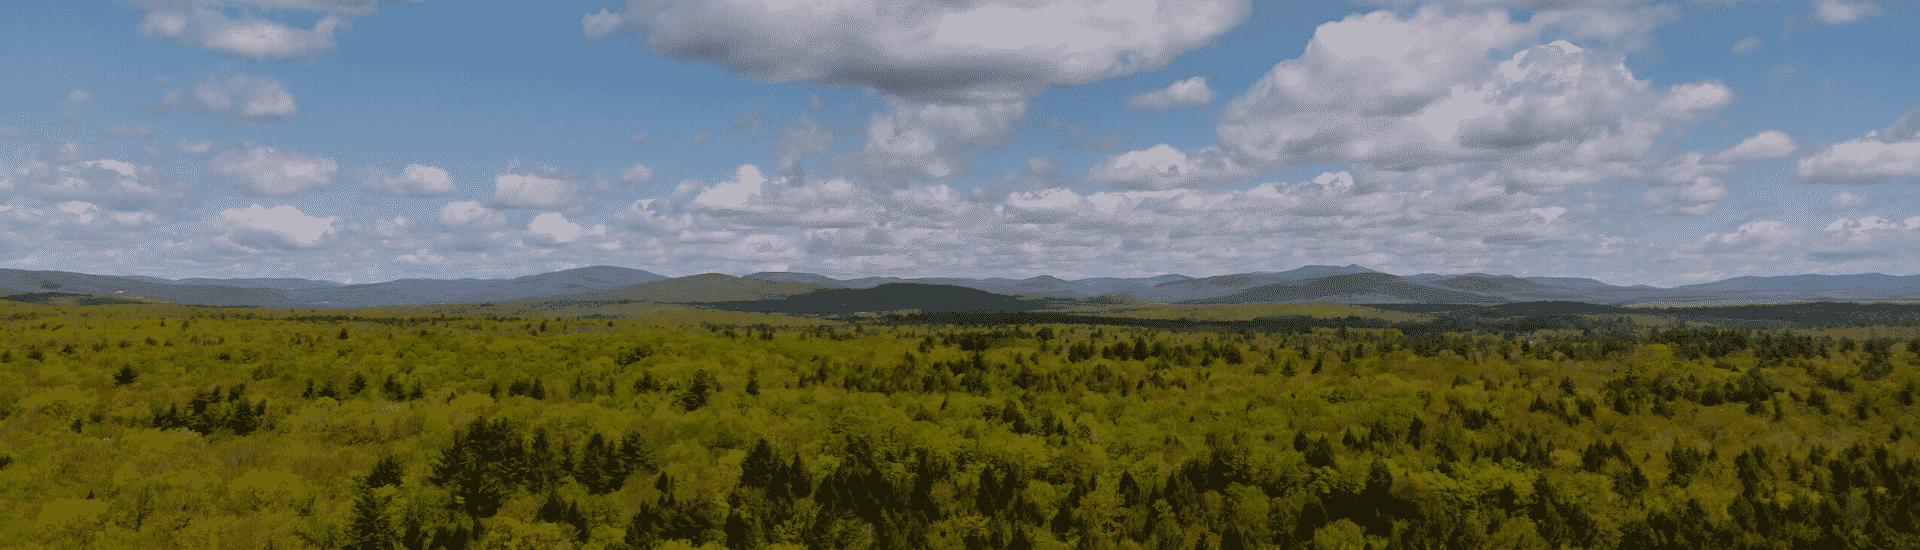 Pocono Mountains Visitors Bureau Picks Up the Poconos